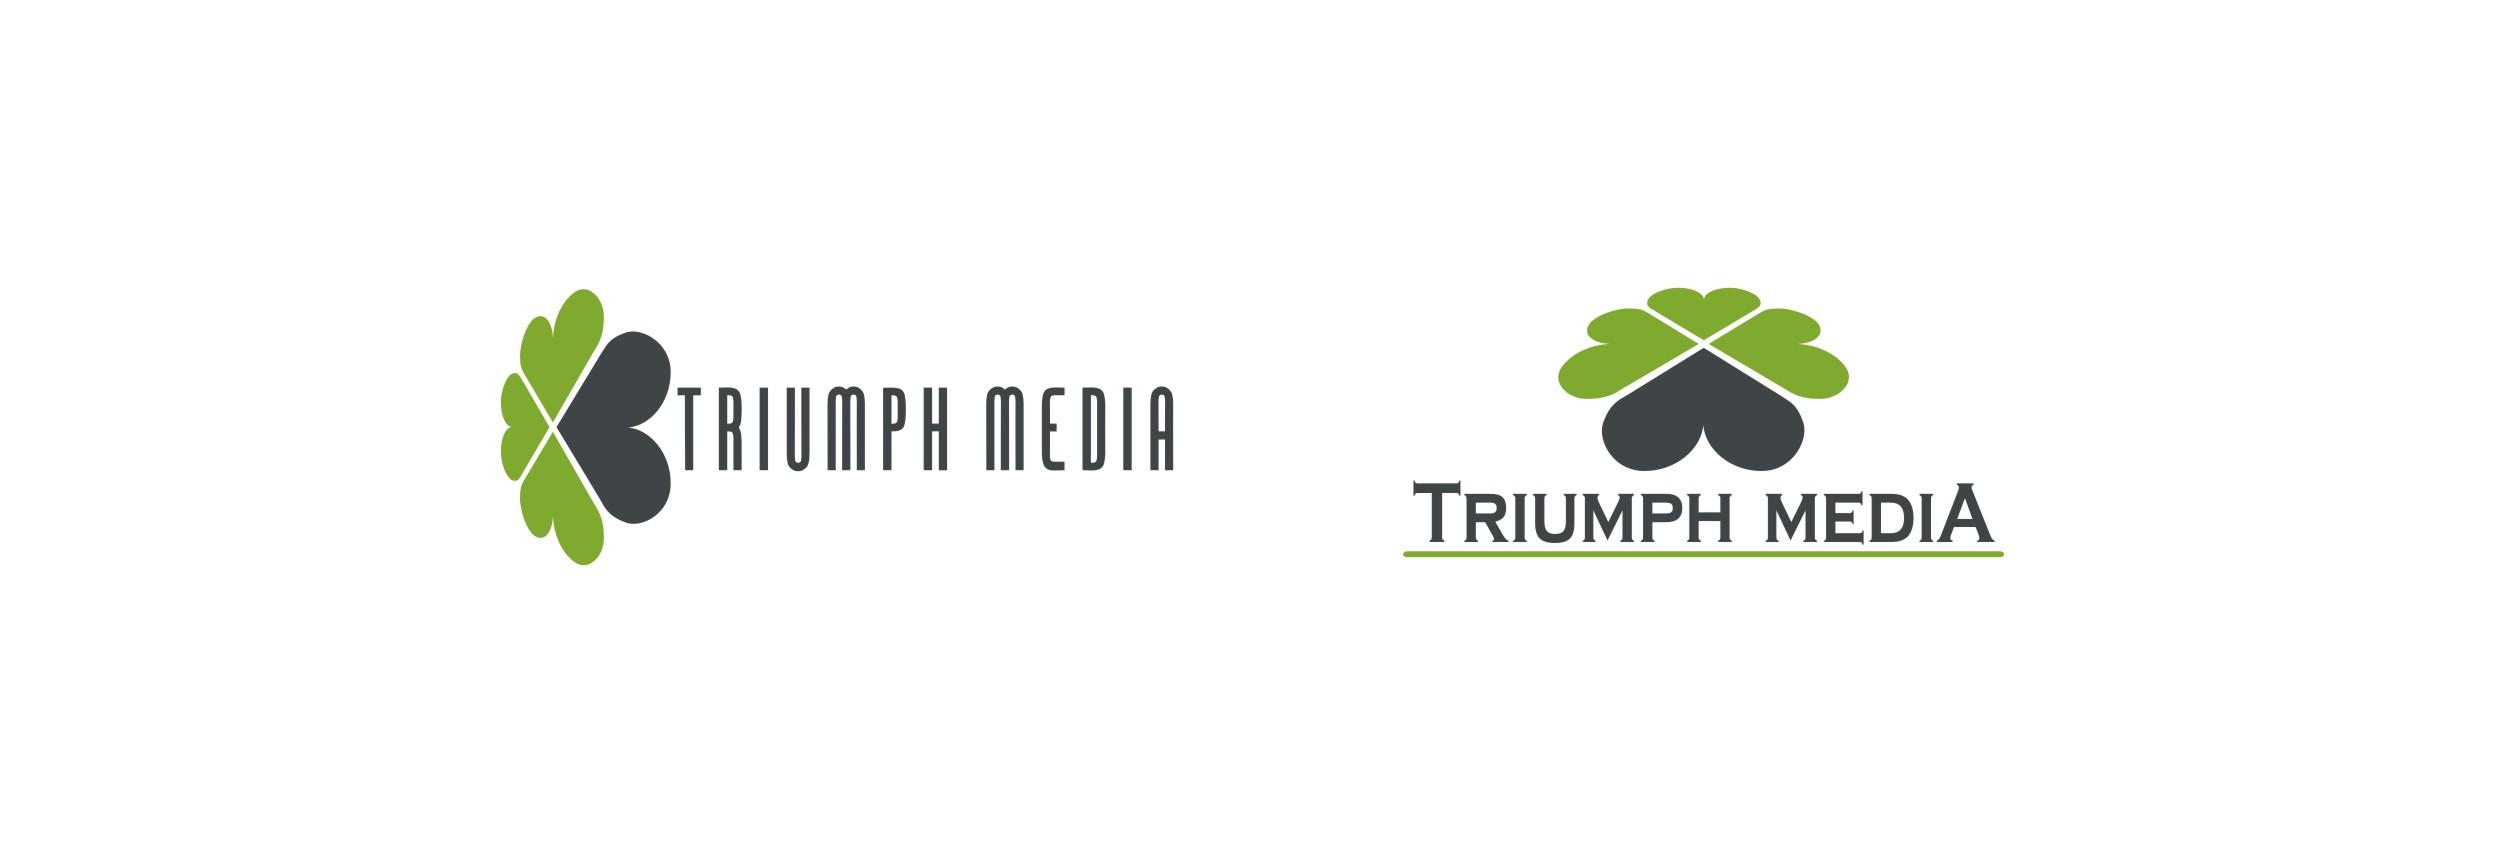 Разработка логотипа  TRIUMPH MEDIA с изображением клевера фото f_506ece0ba7924.jpg